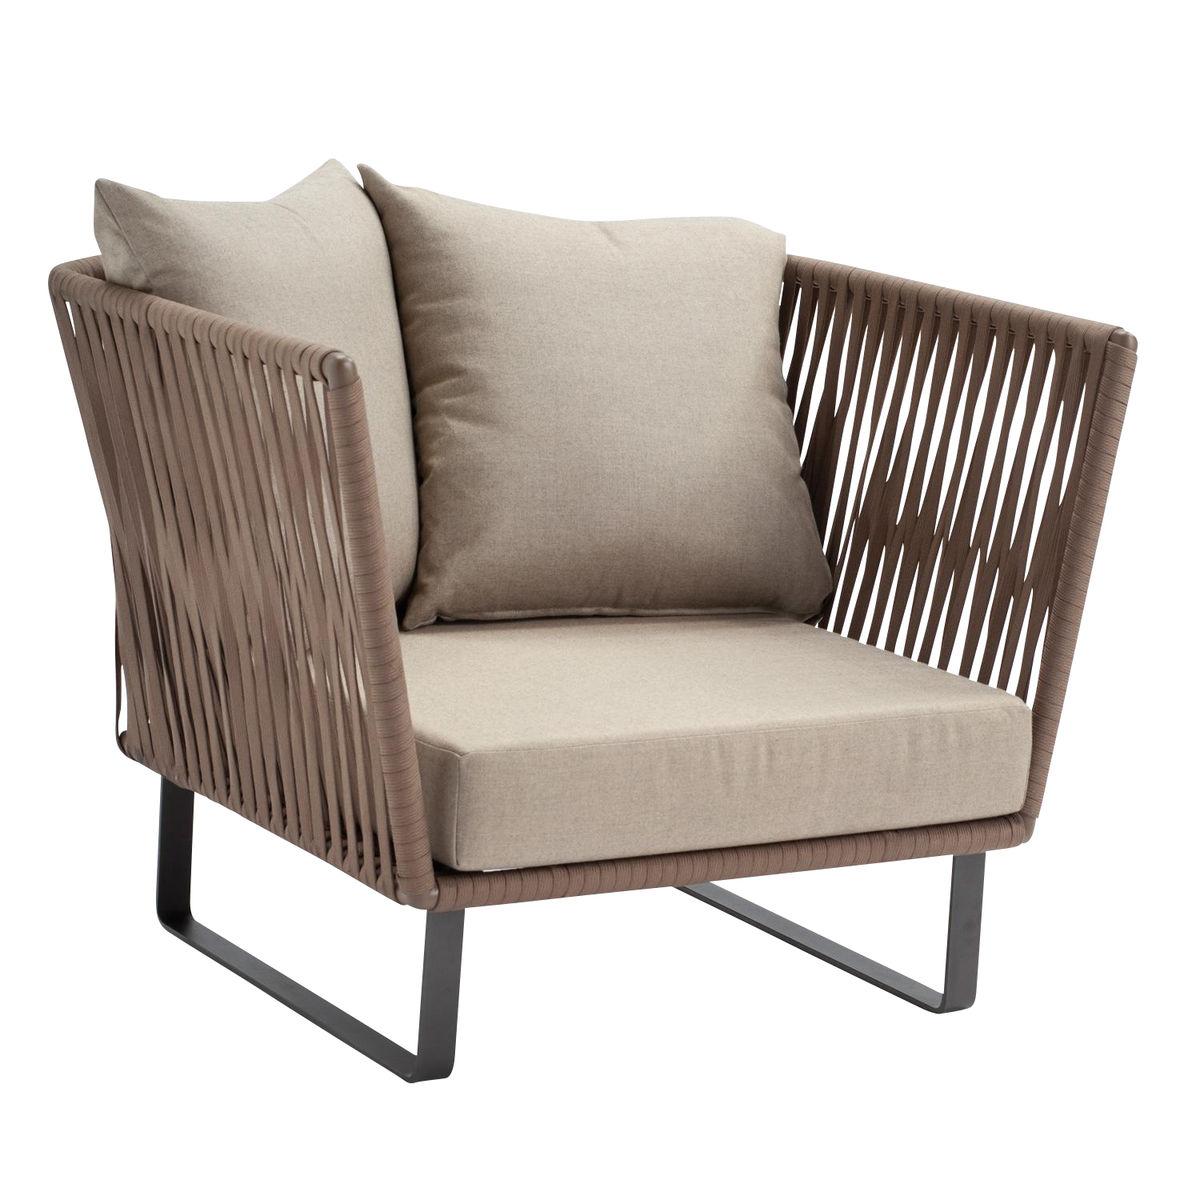 bitta club armchair garden chair kettal. Black Bedroom Furniture Sets. Home Design Ideas